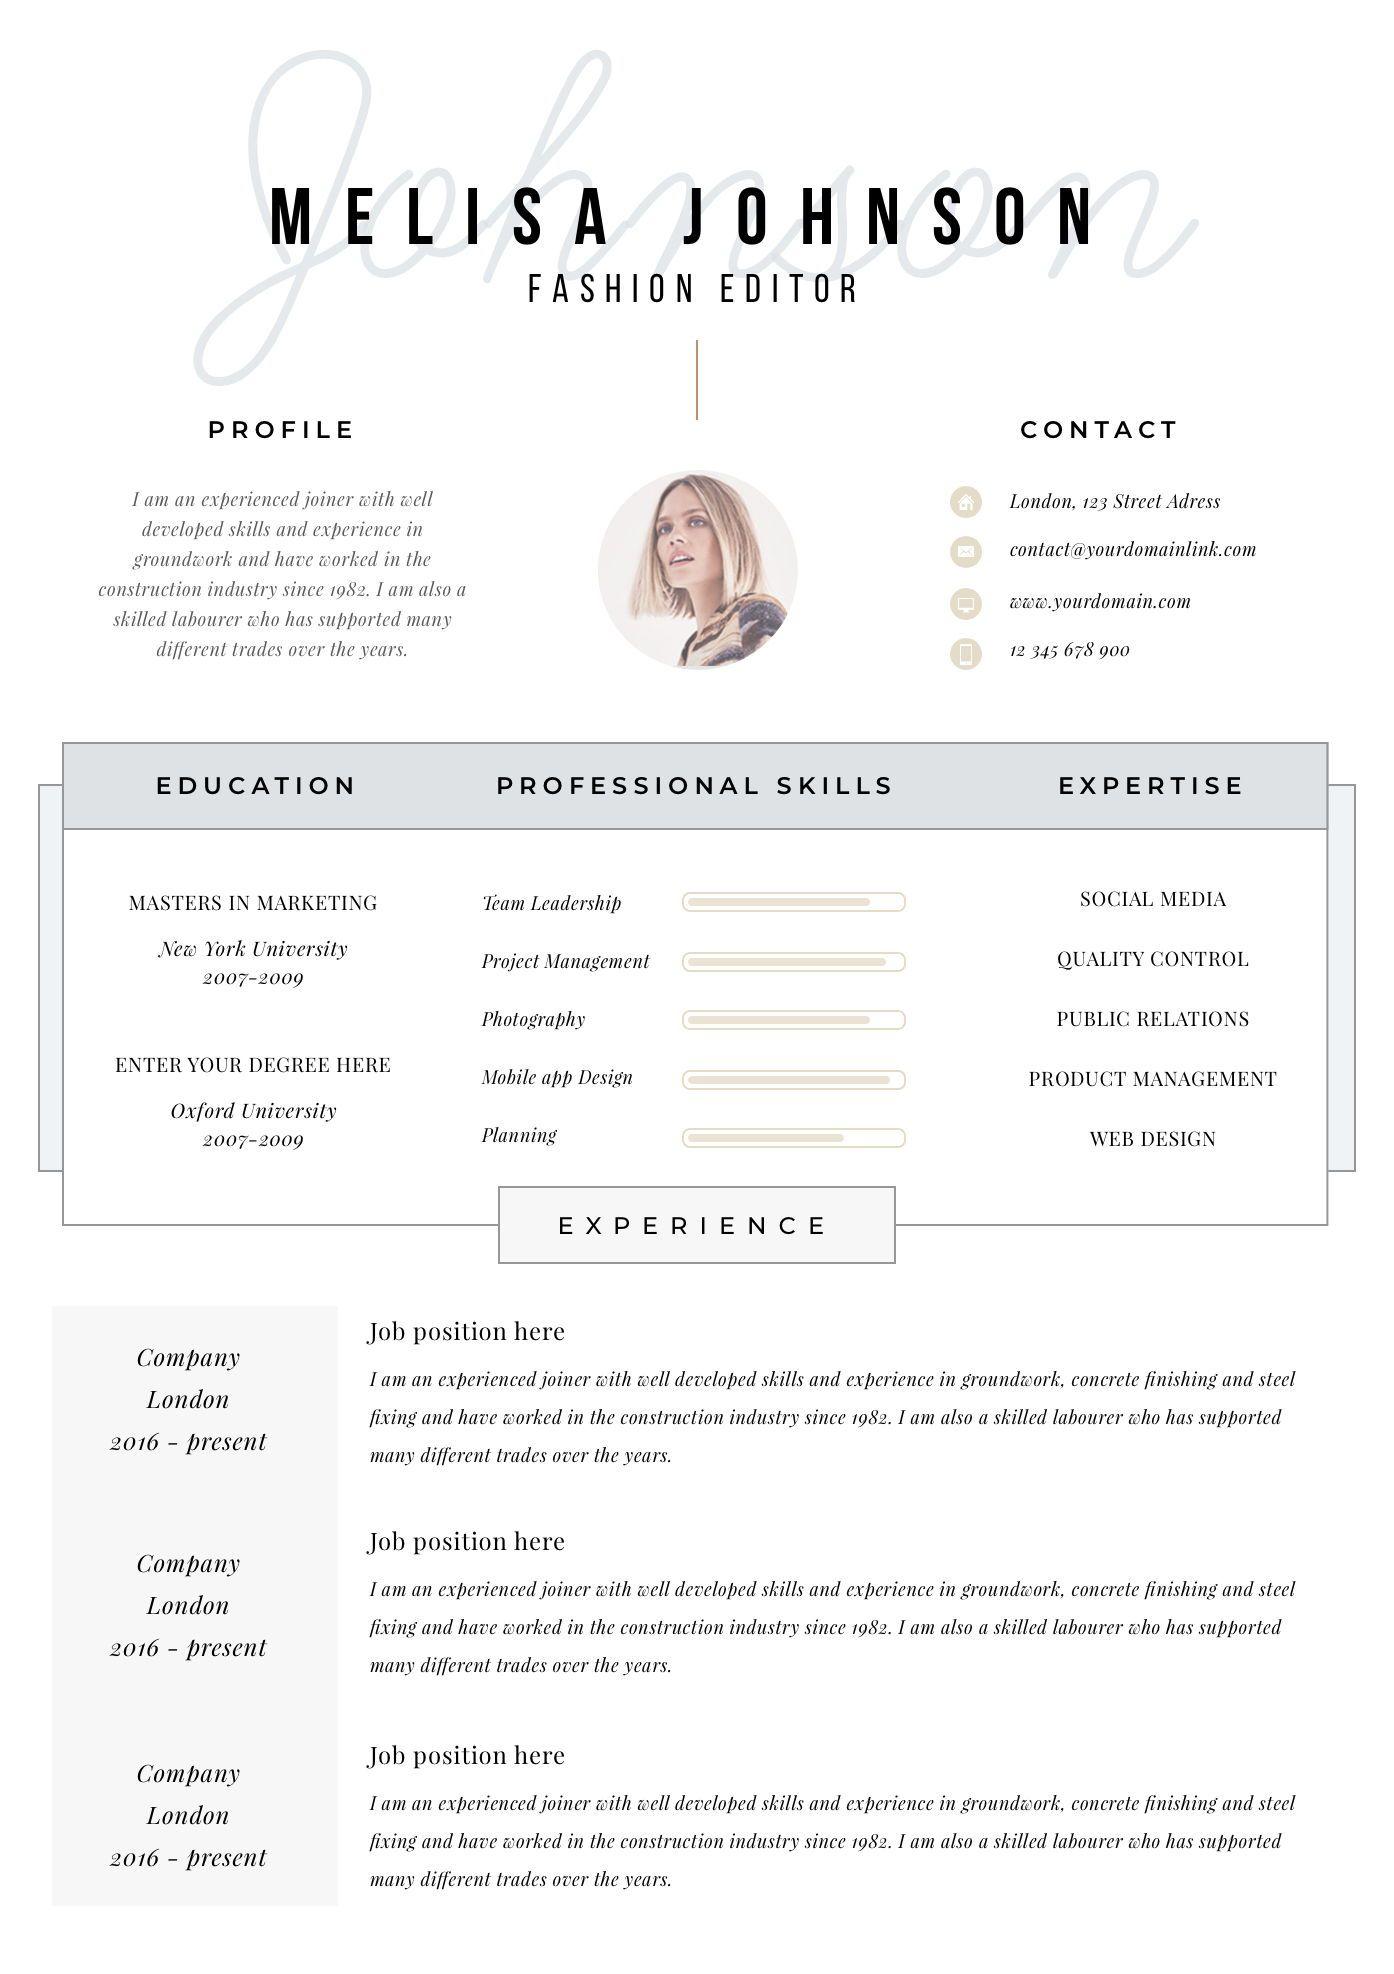 Resume Template Resume Cv Template Cv Design Curriculum Vitae Cv Instant Download Resume Resume Templates Cv Amsterdam Resume Template Resume Templates Cv Template